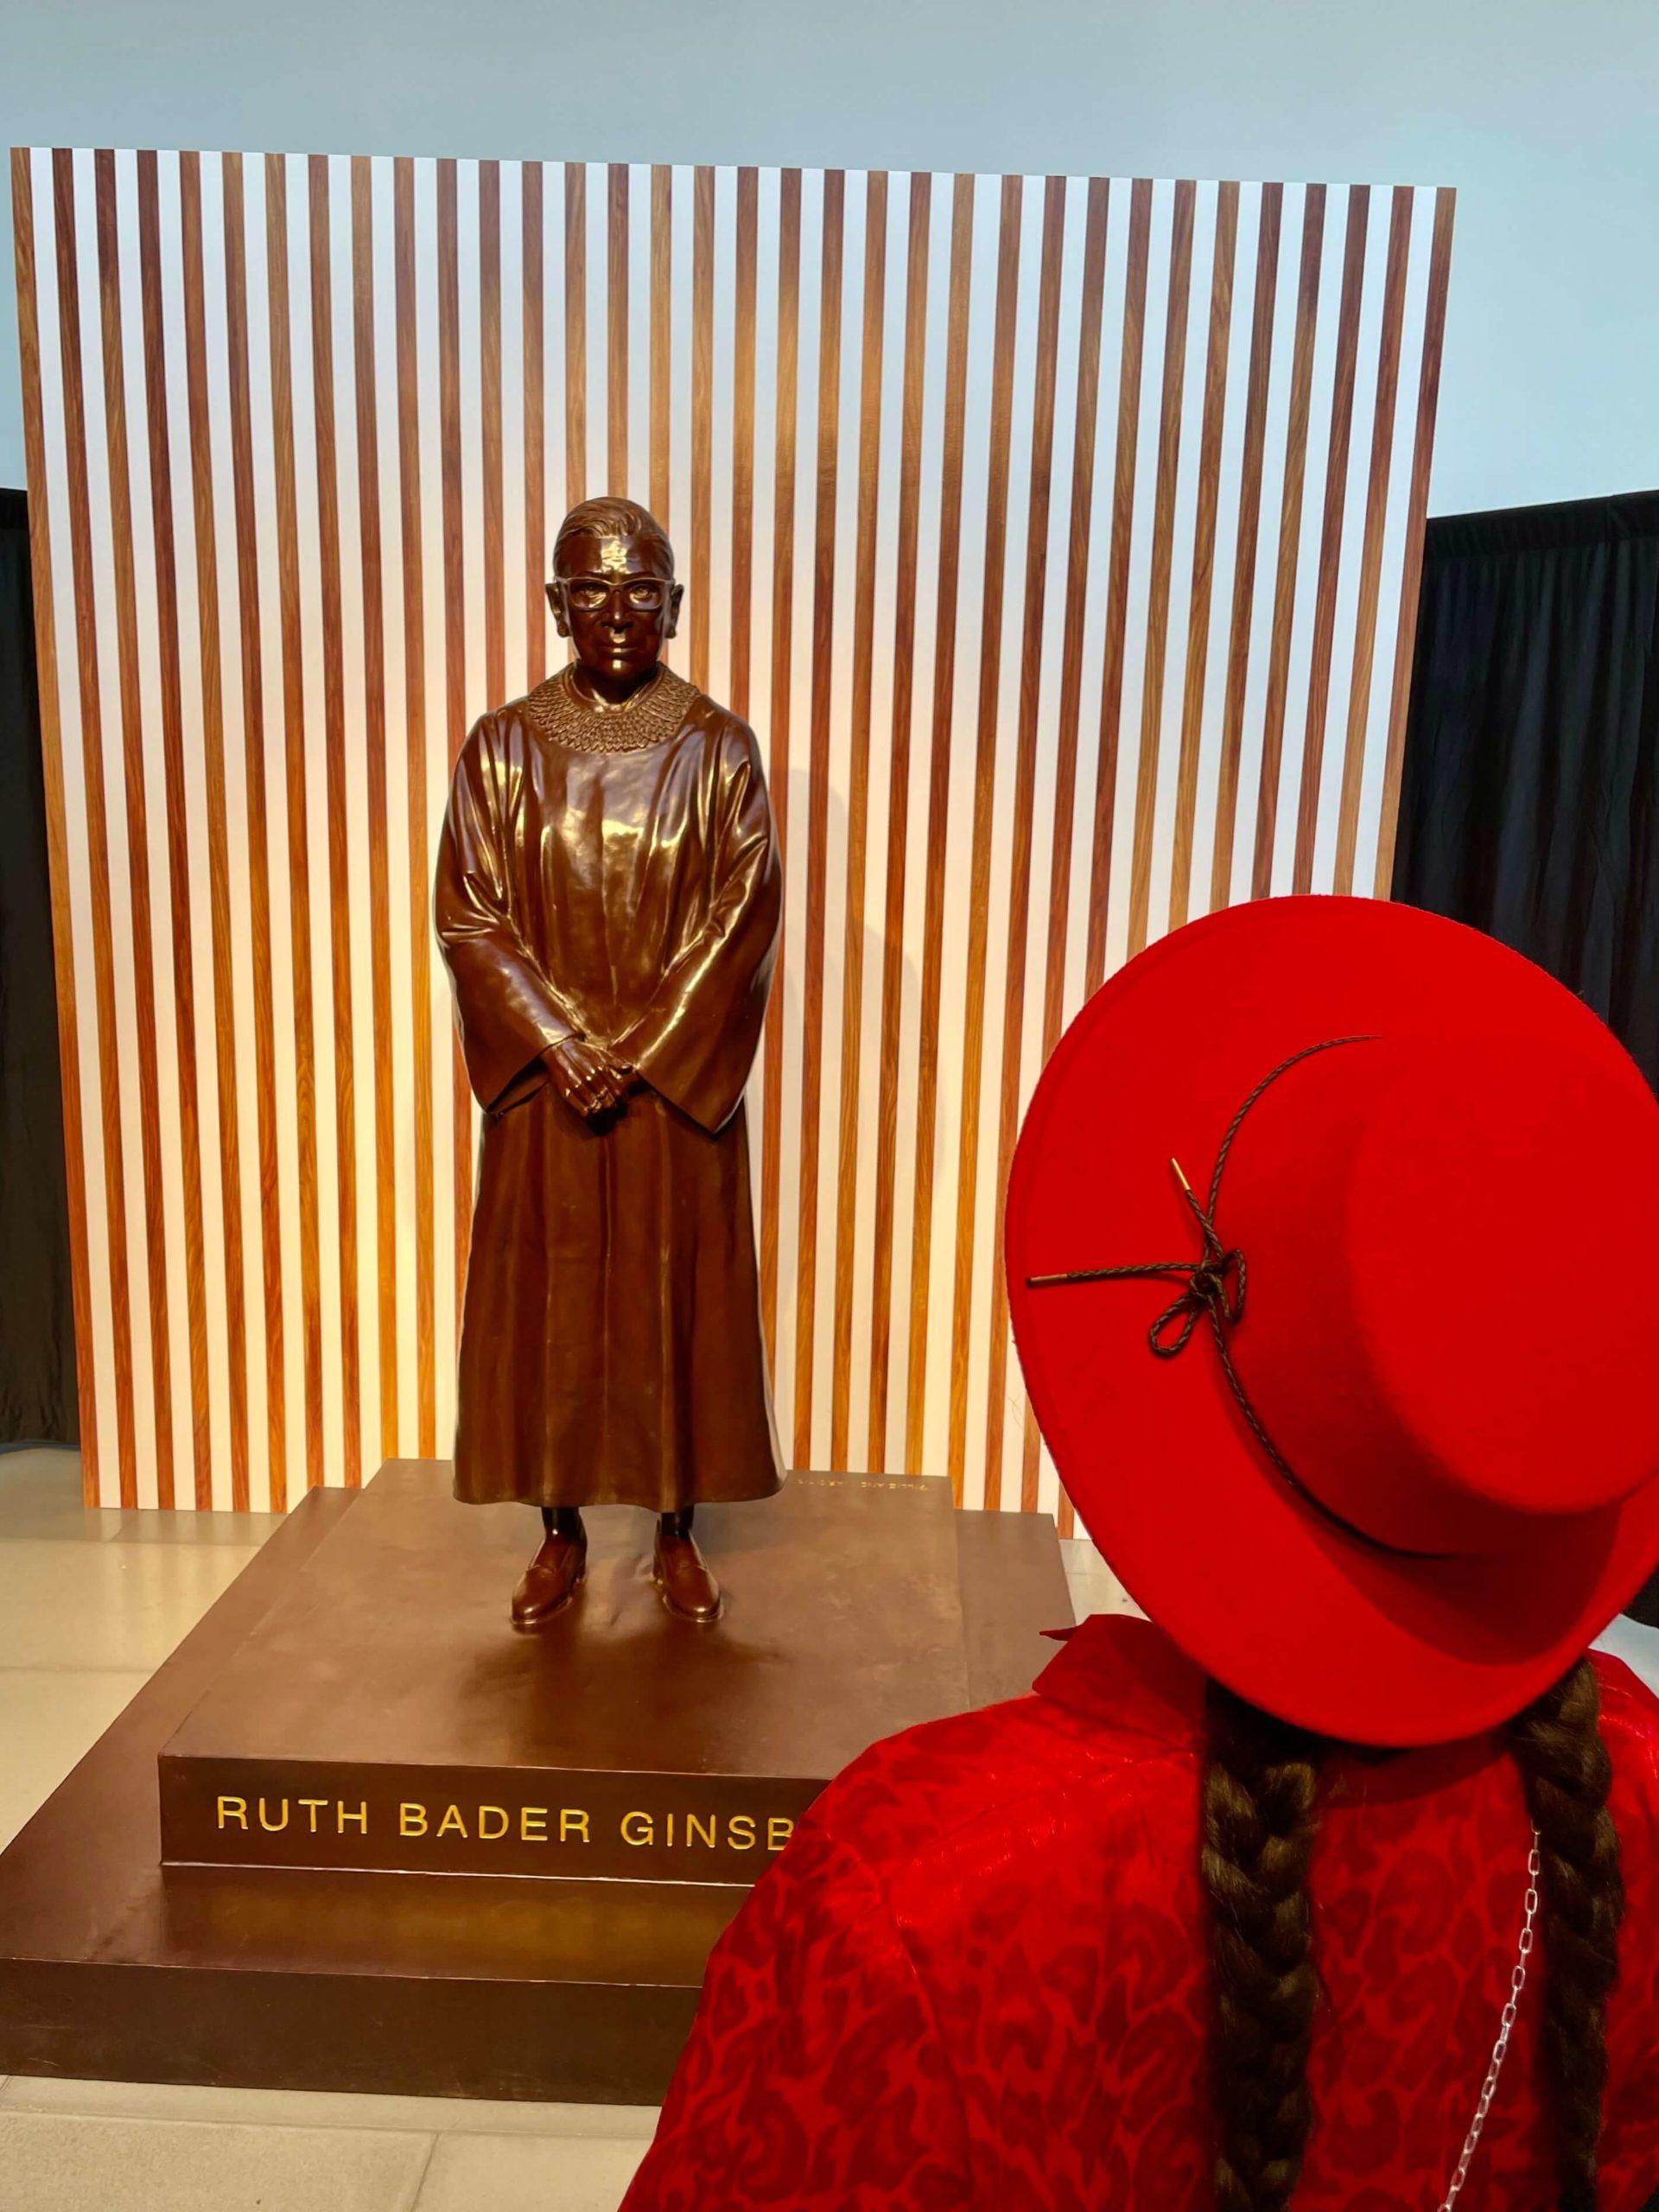 Riaperture a New York Ruth Bader Ginsburg